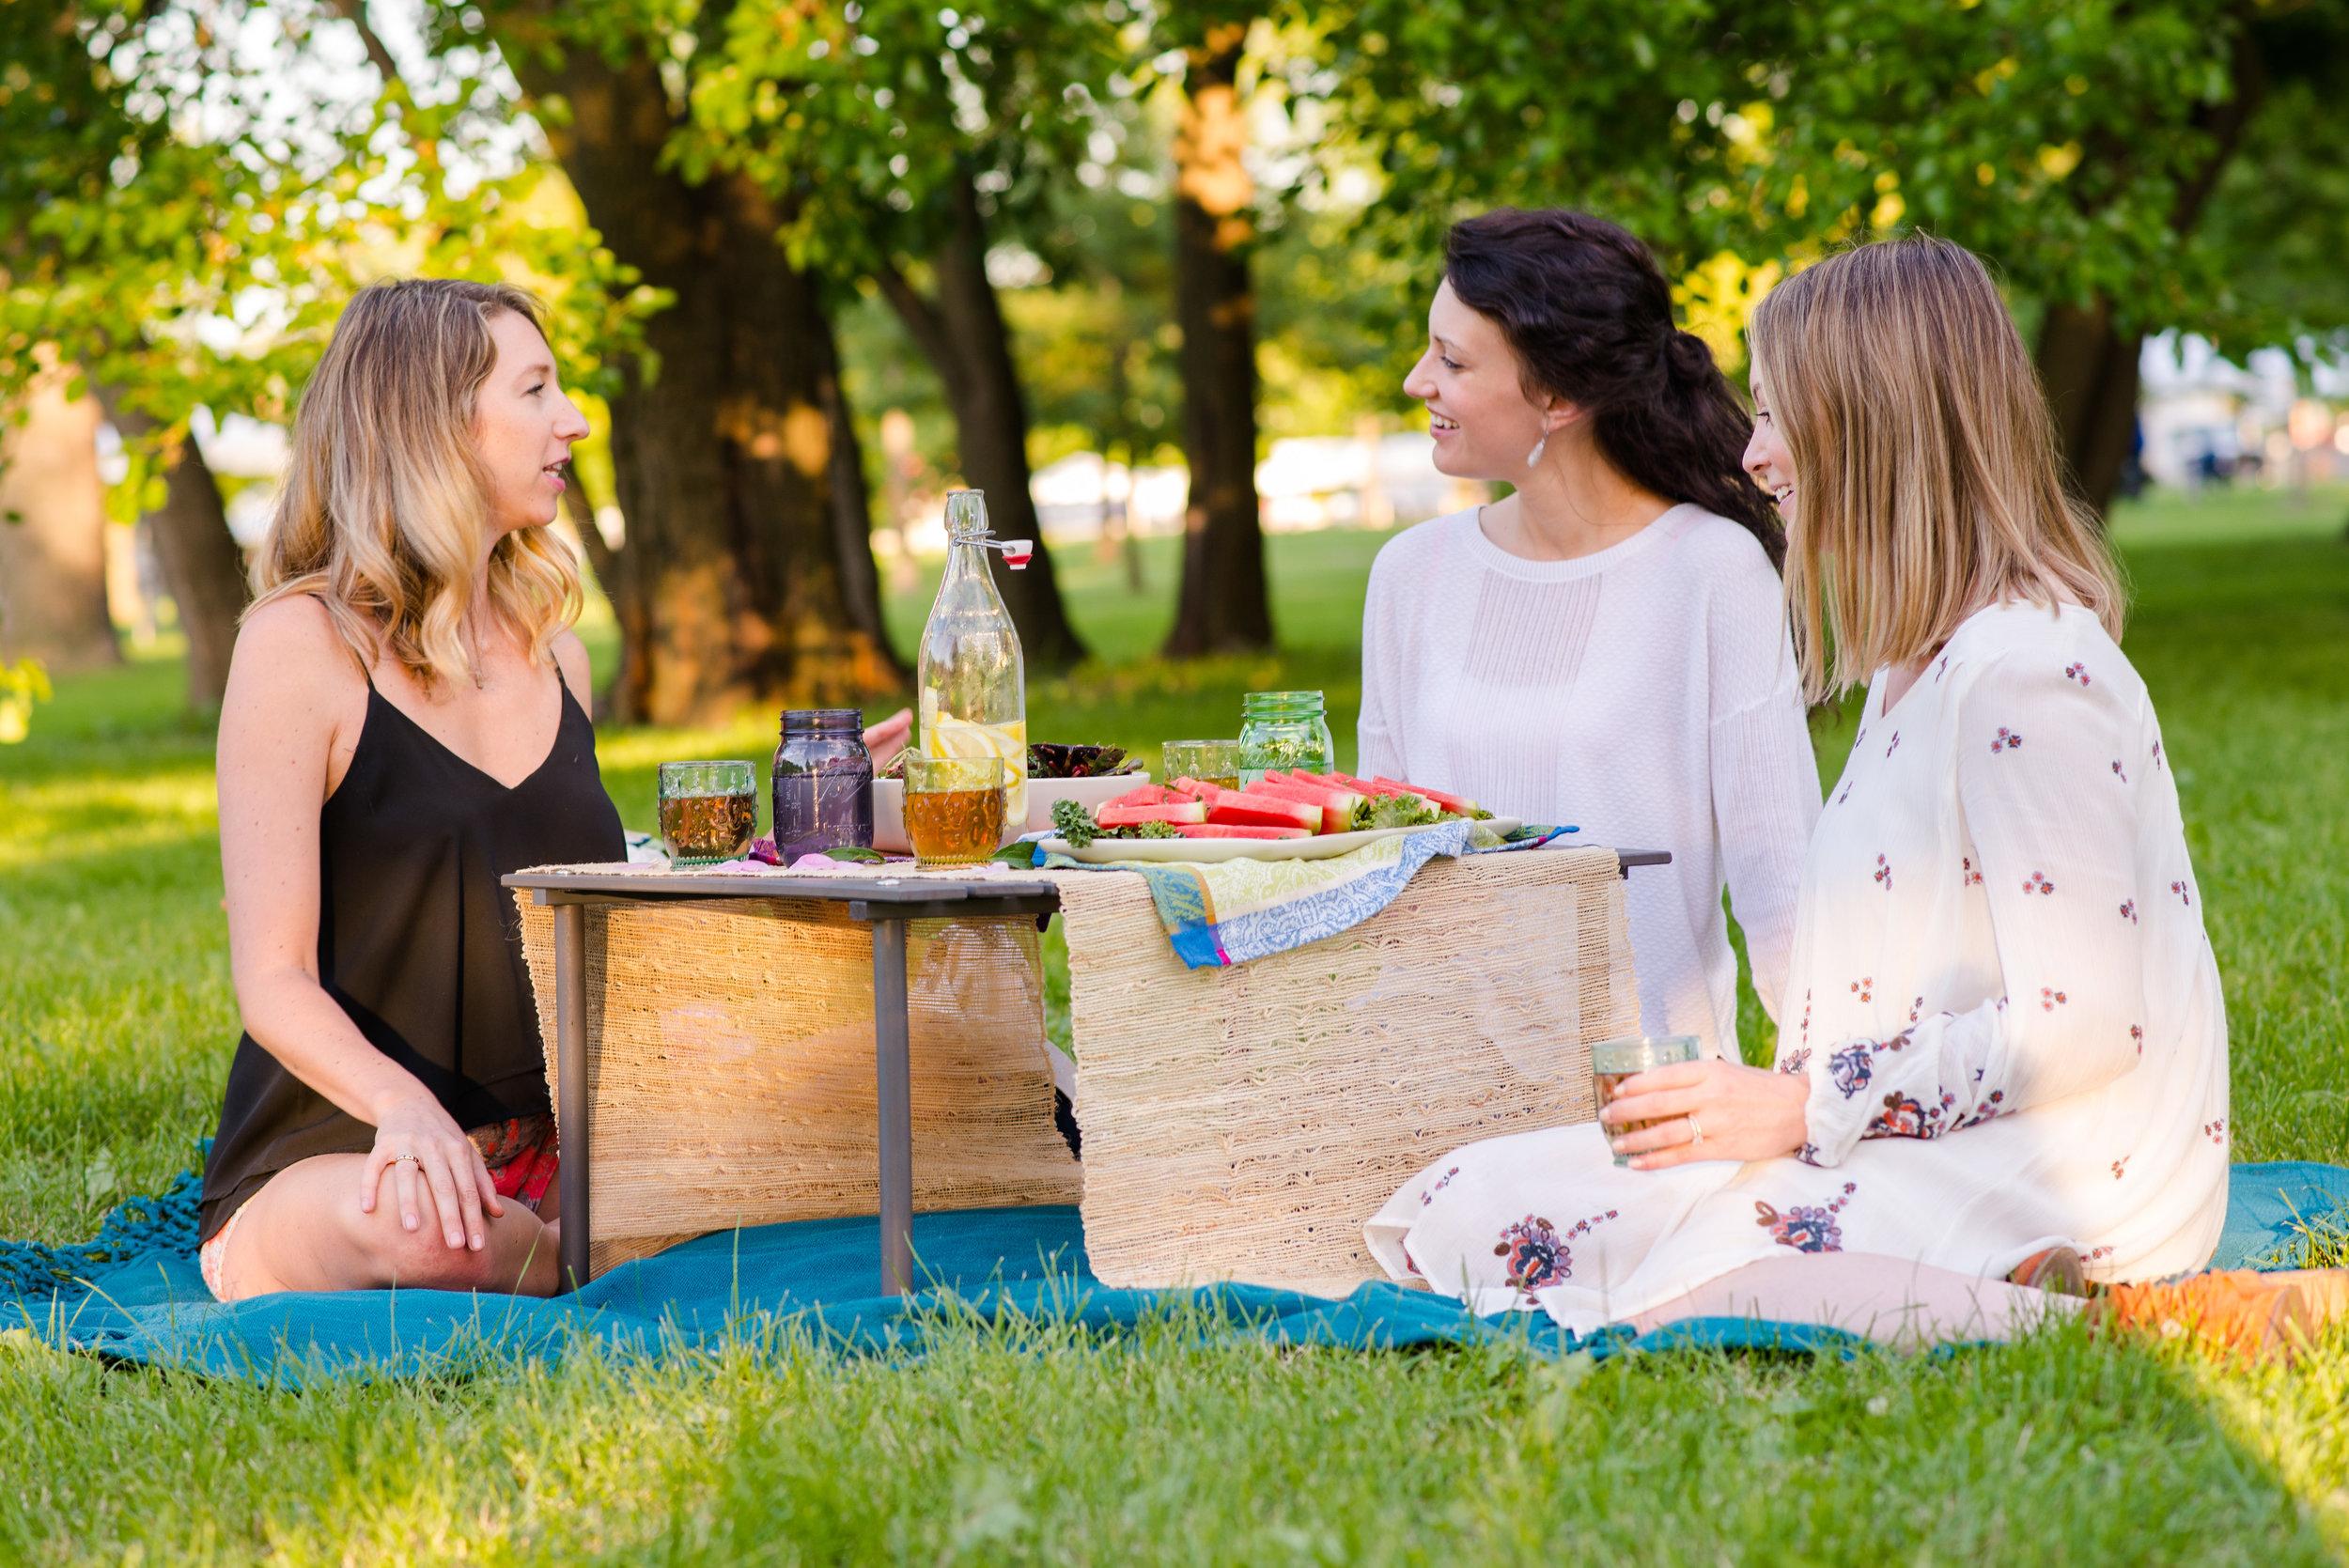 summer_harvest_picnic.jpg